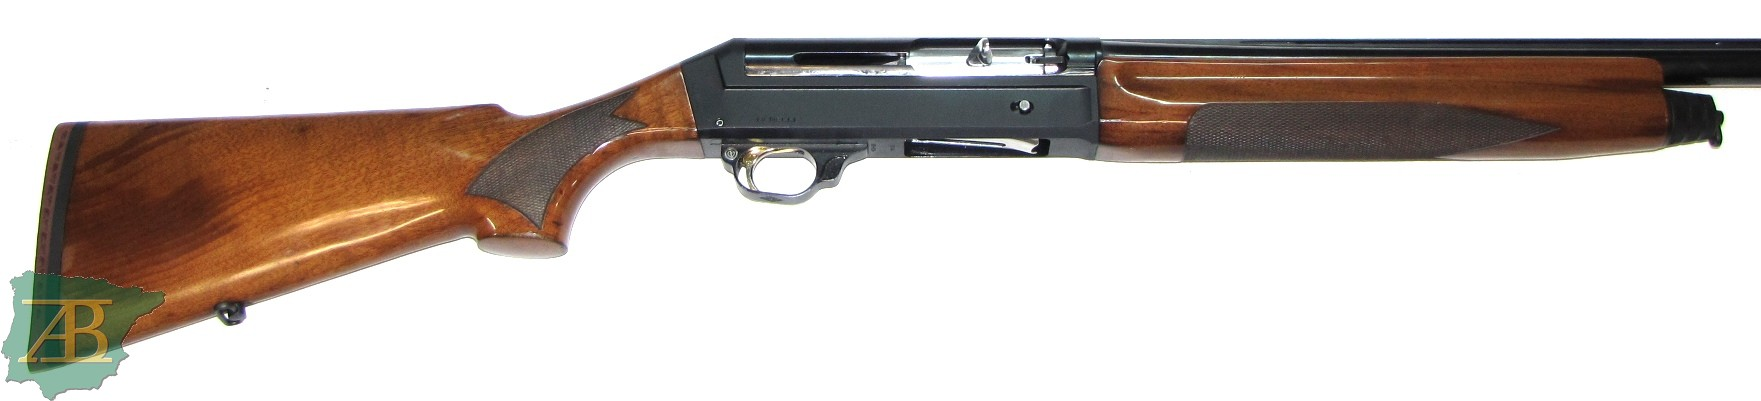 Escopeta semiautomática de caza BENELLI PREMIUM SUPERLIGERA Ref 5763-armeriaiberica-2